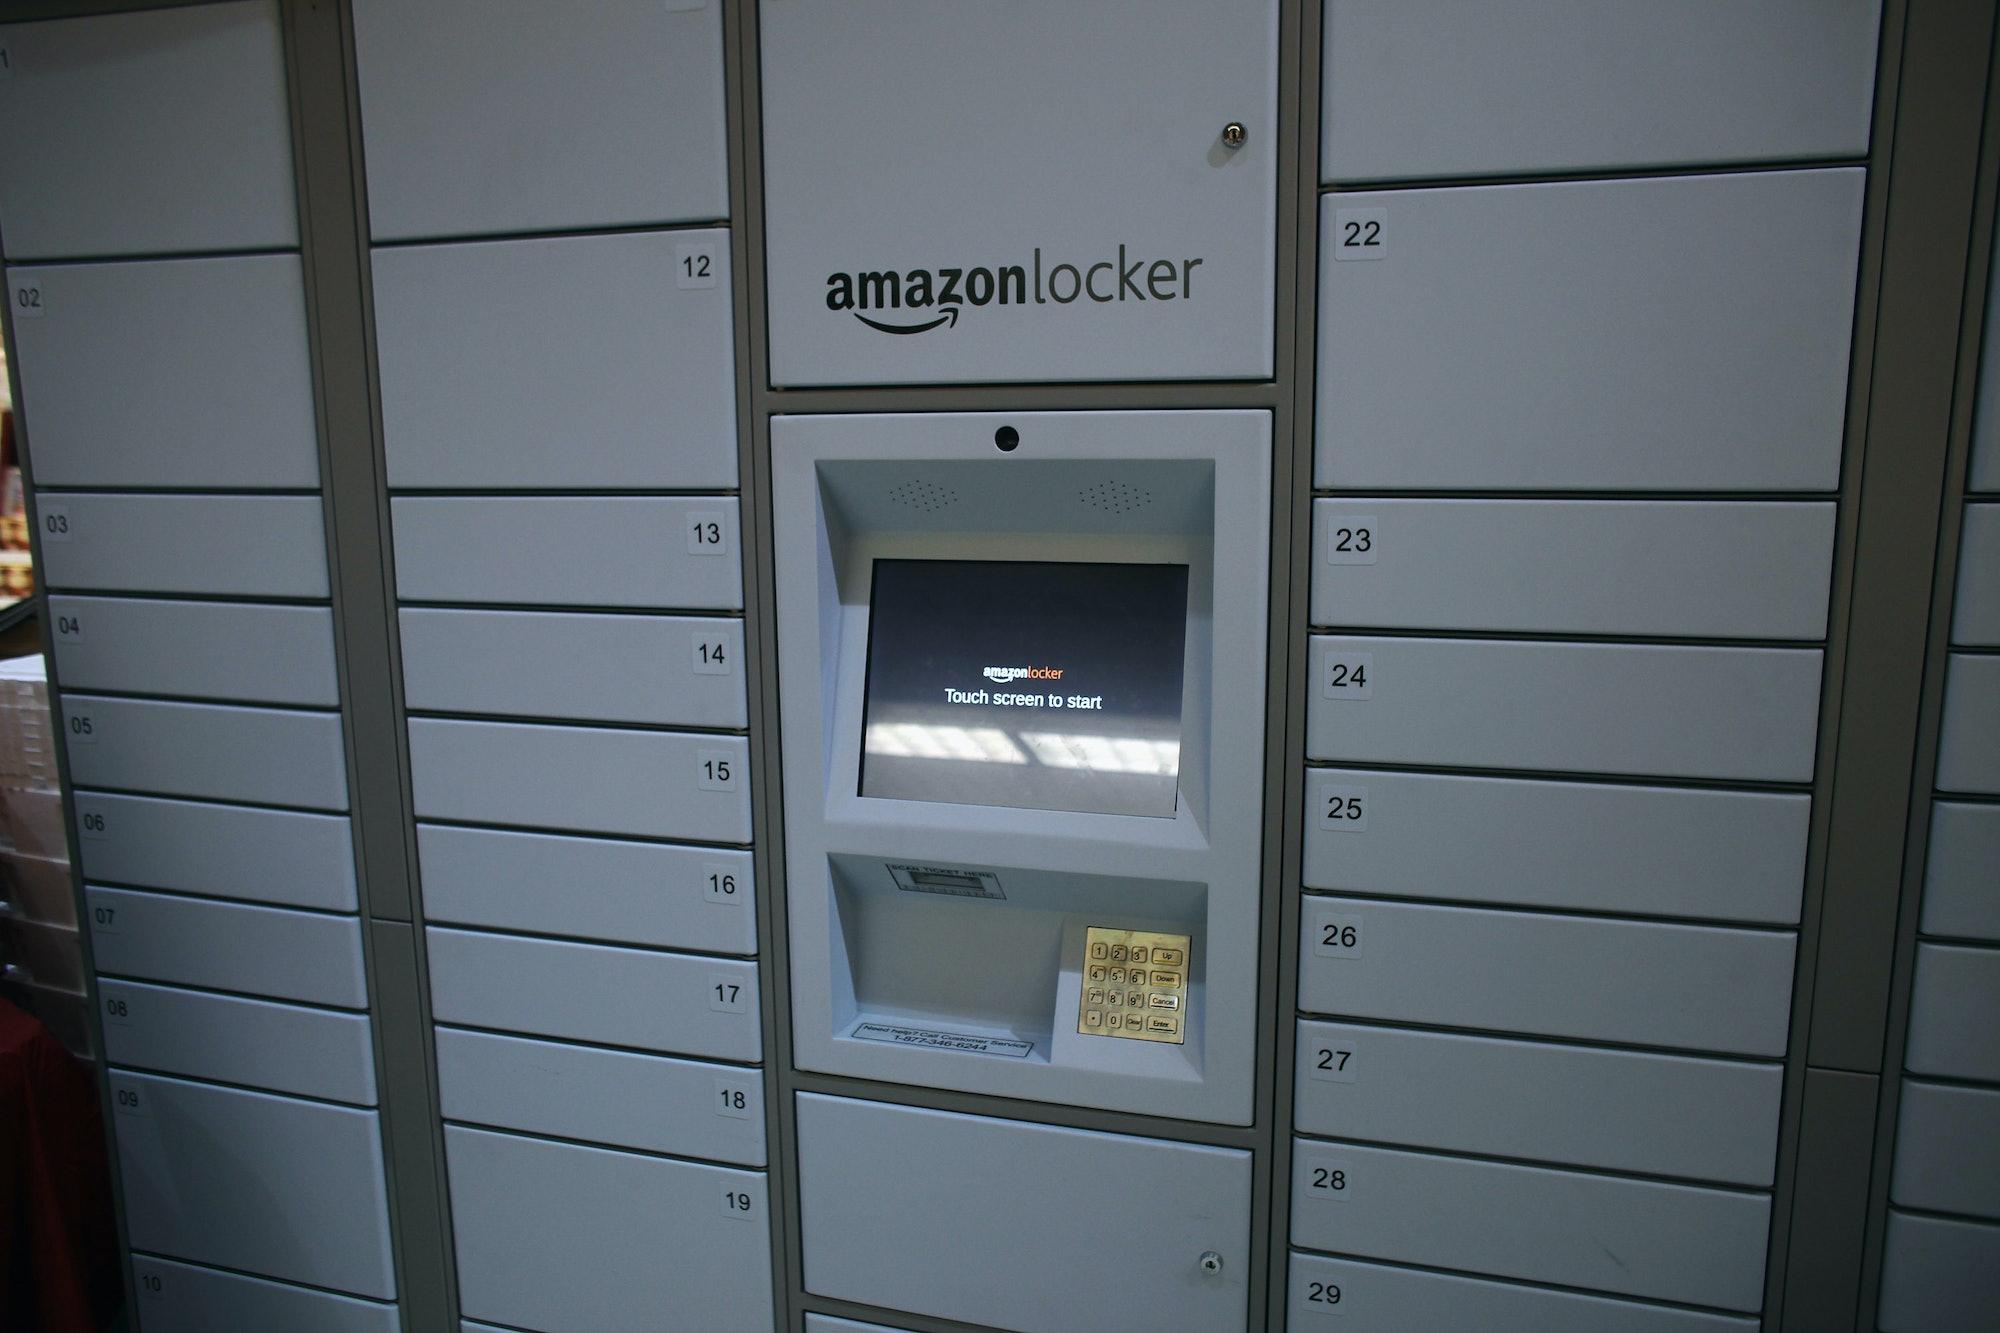 Amazon Locker